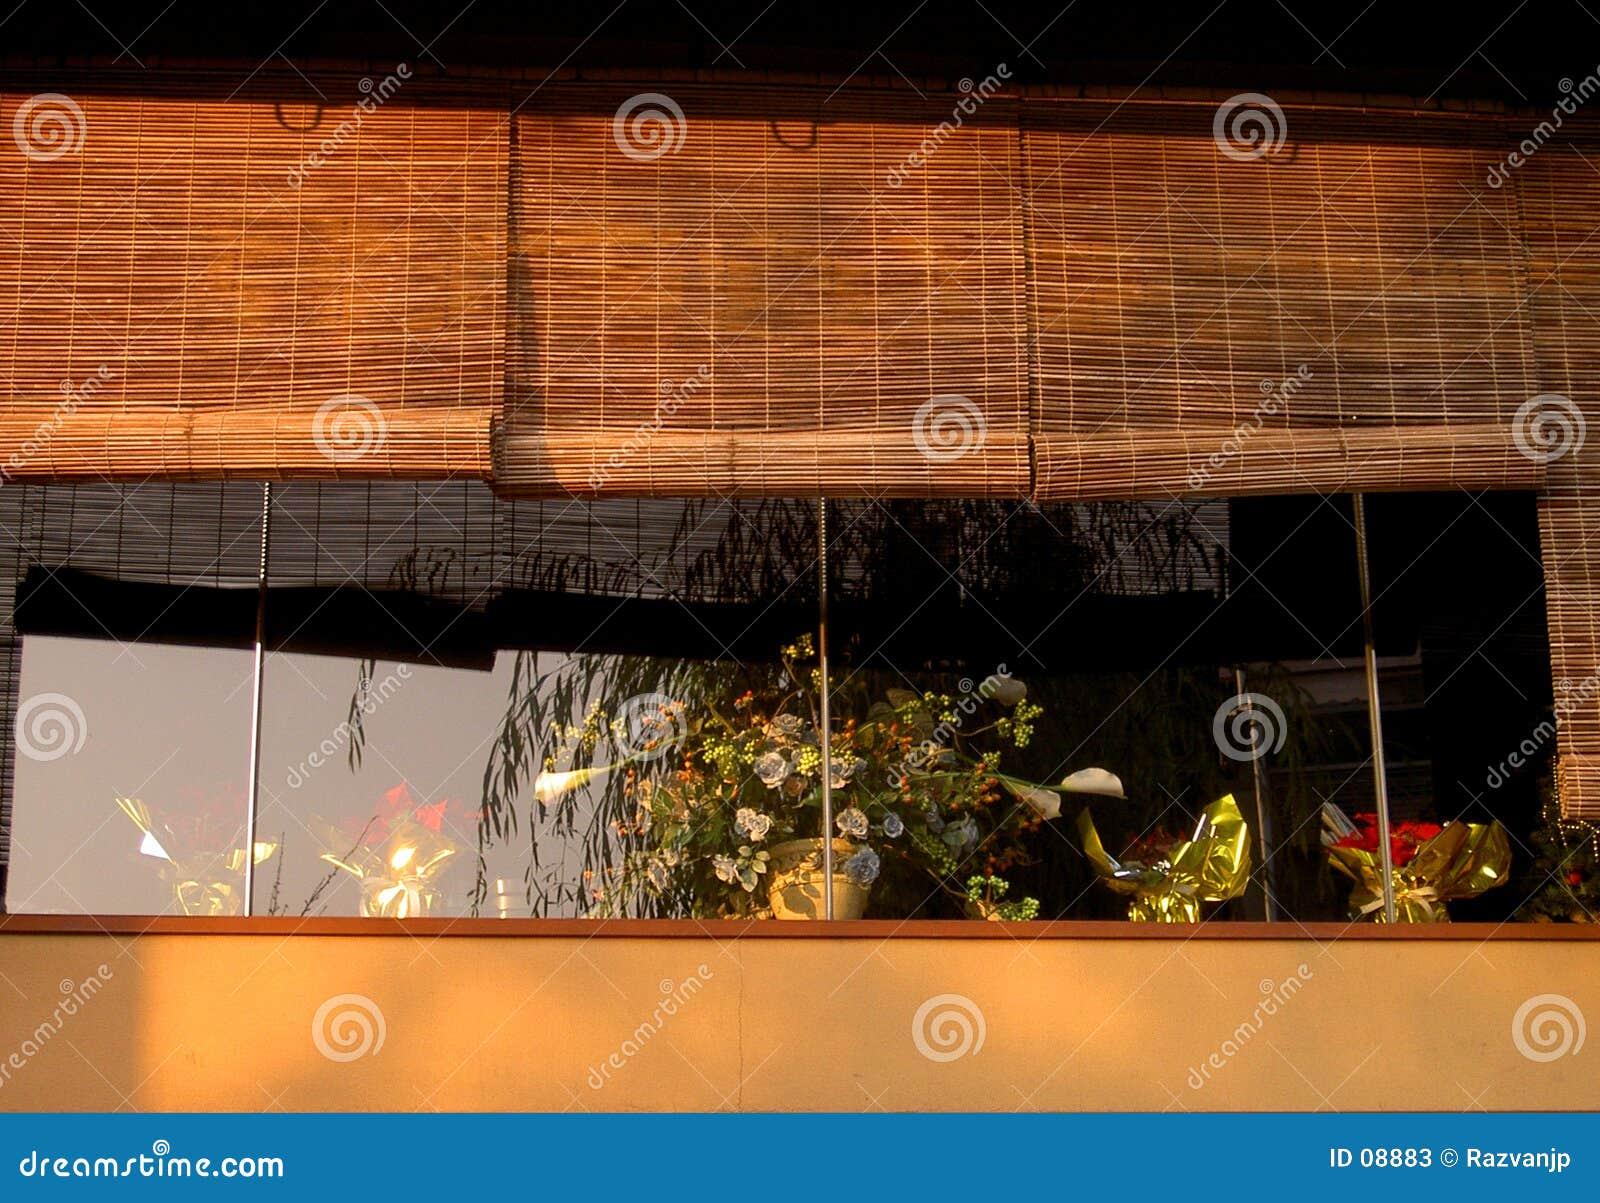 Gion window